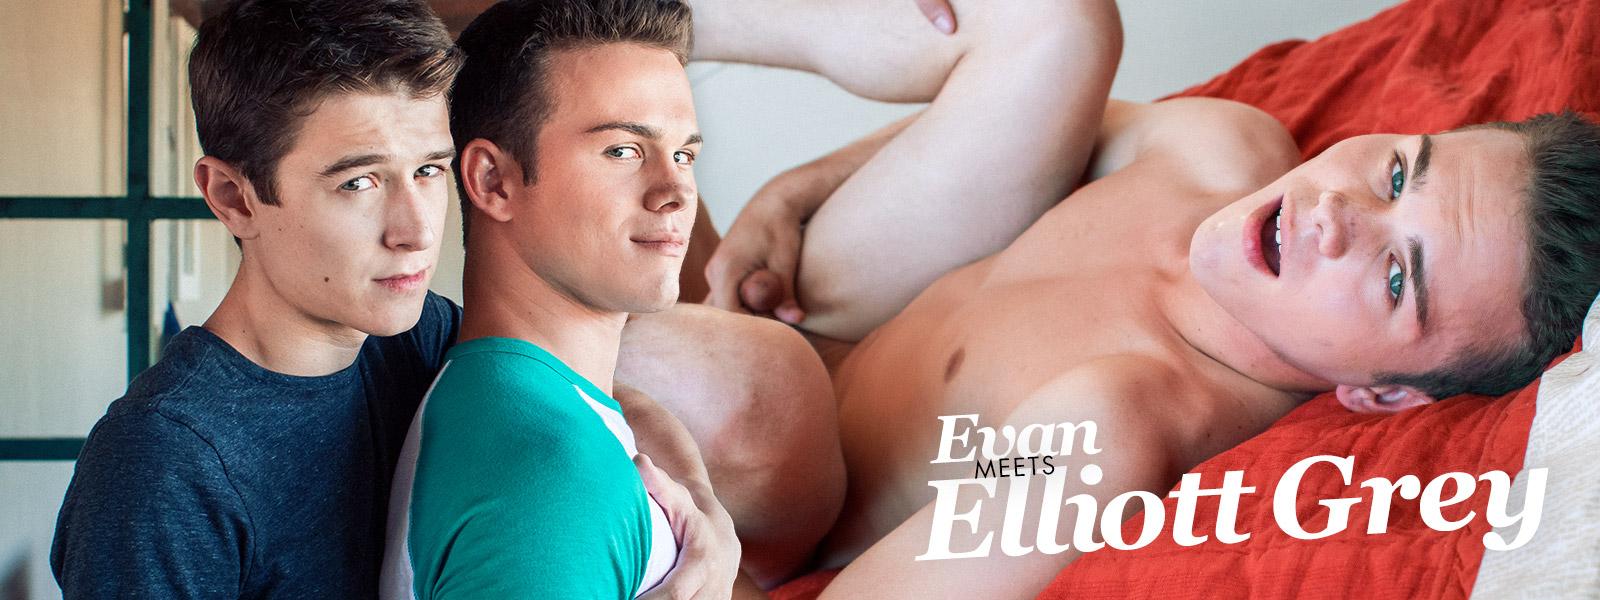 Evan Meats Elliott Grey